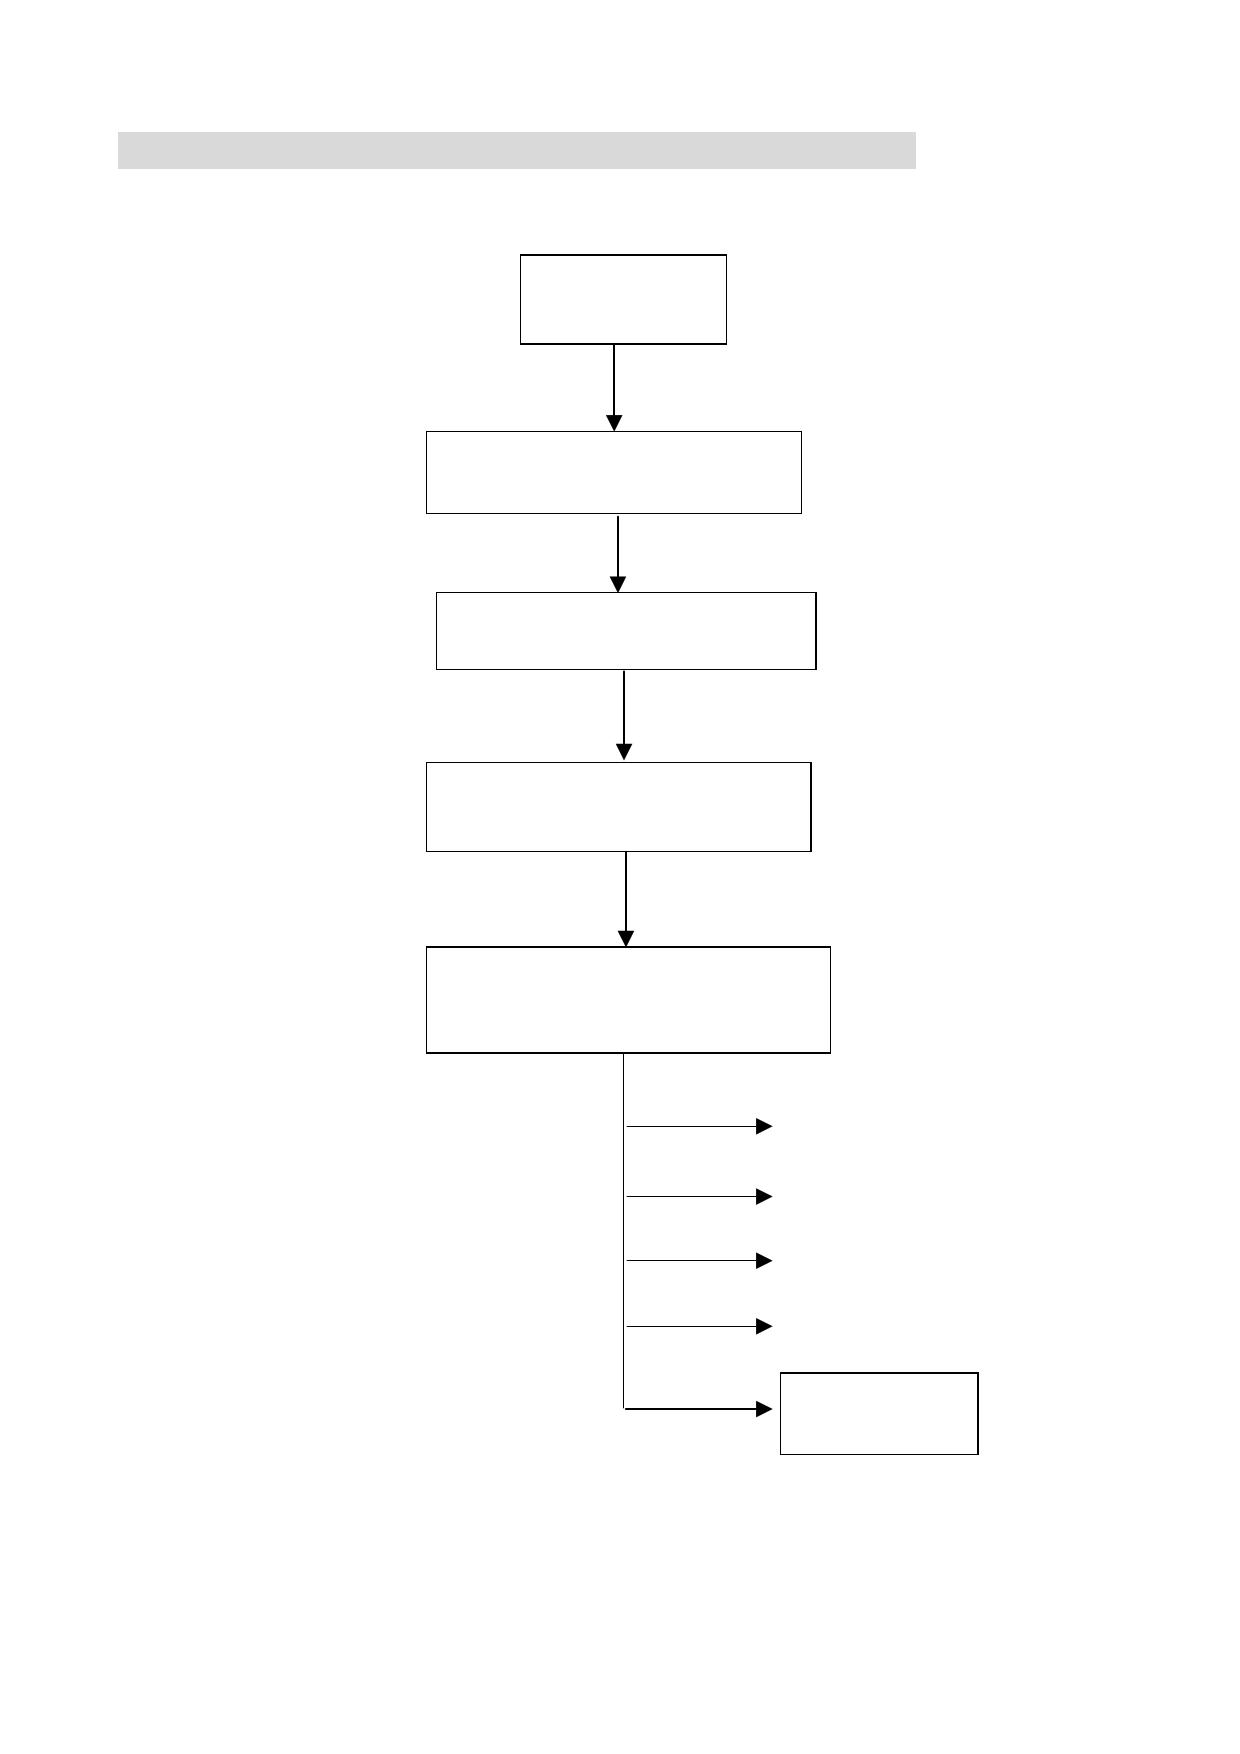 H-MS1107 pdf, arduino